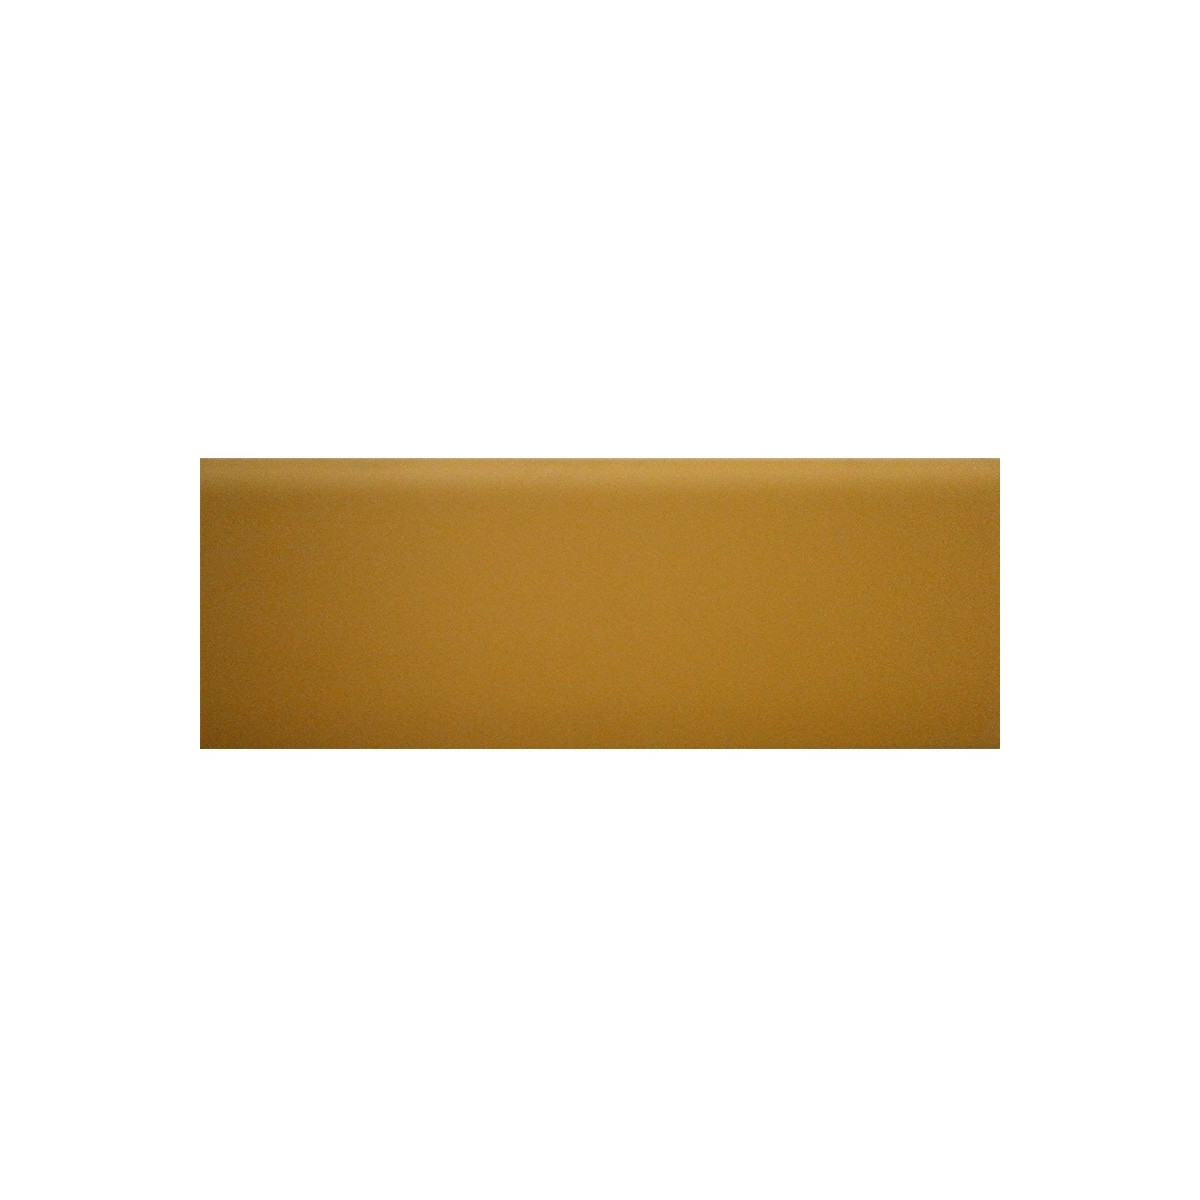 Rodapié Ocre Victorian 7,5x20 (ud) - Colores lisos para combinar - Marca Mainzu